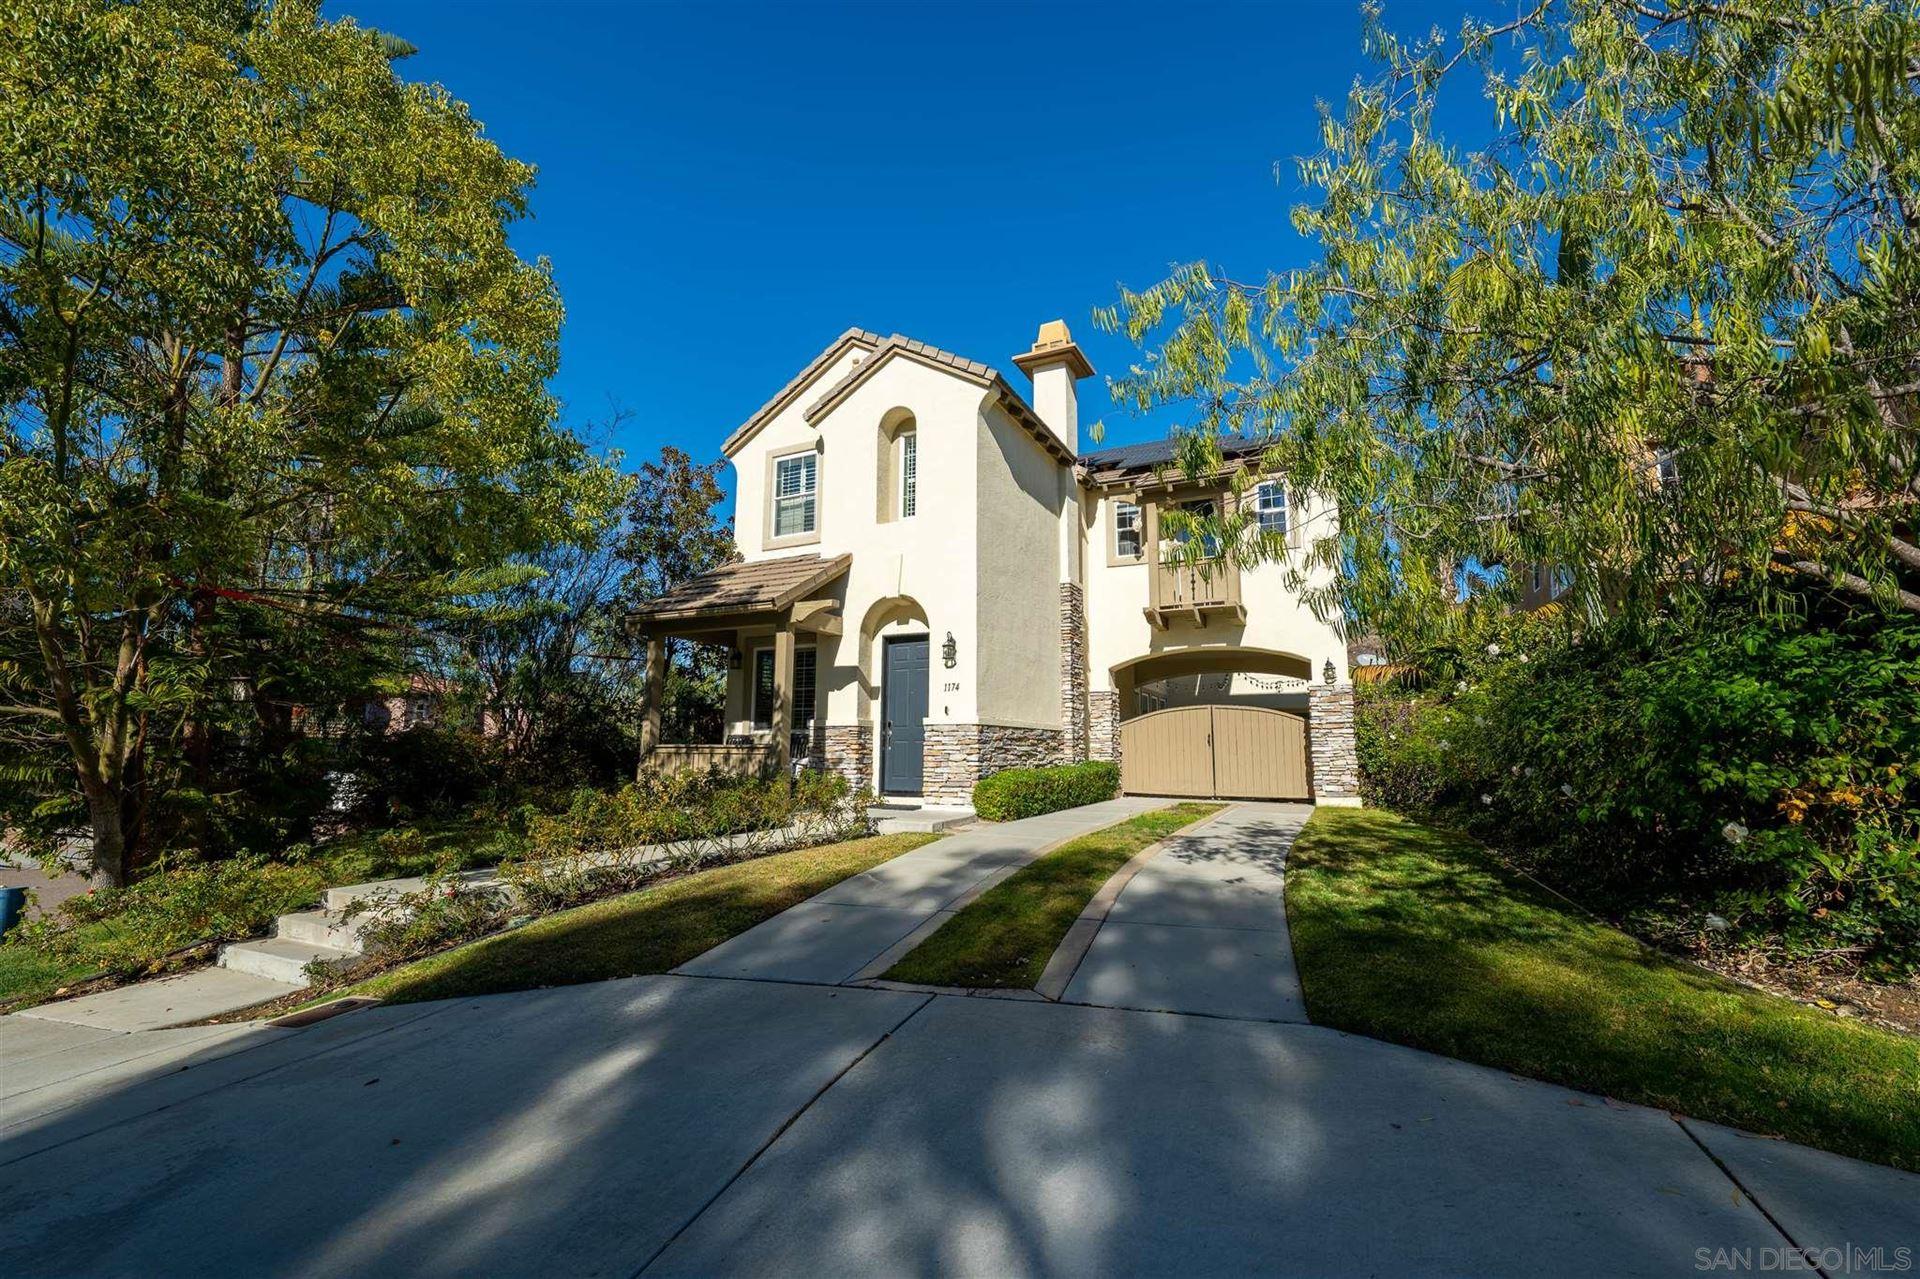 Photo of 1174 Calistoga Way, San Marcos, CA 92078 (MLS # 210001558)